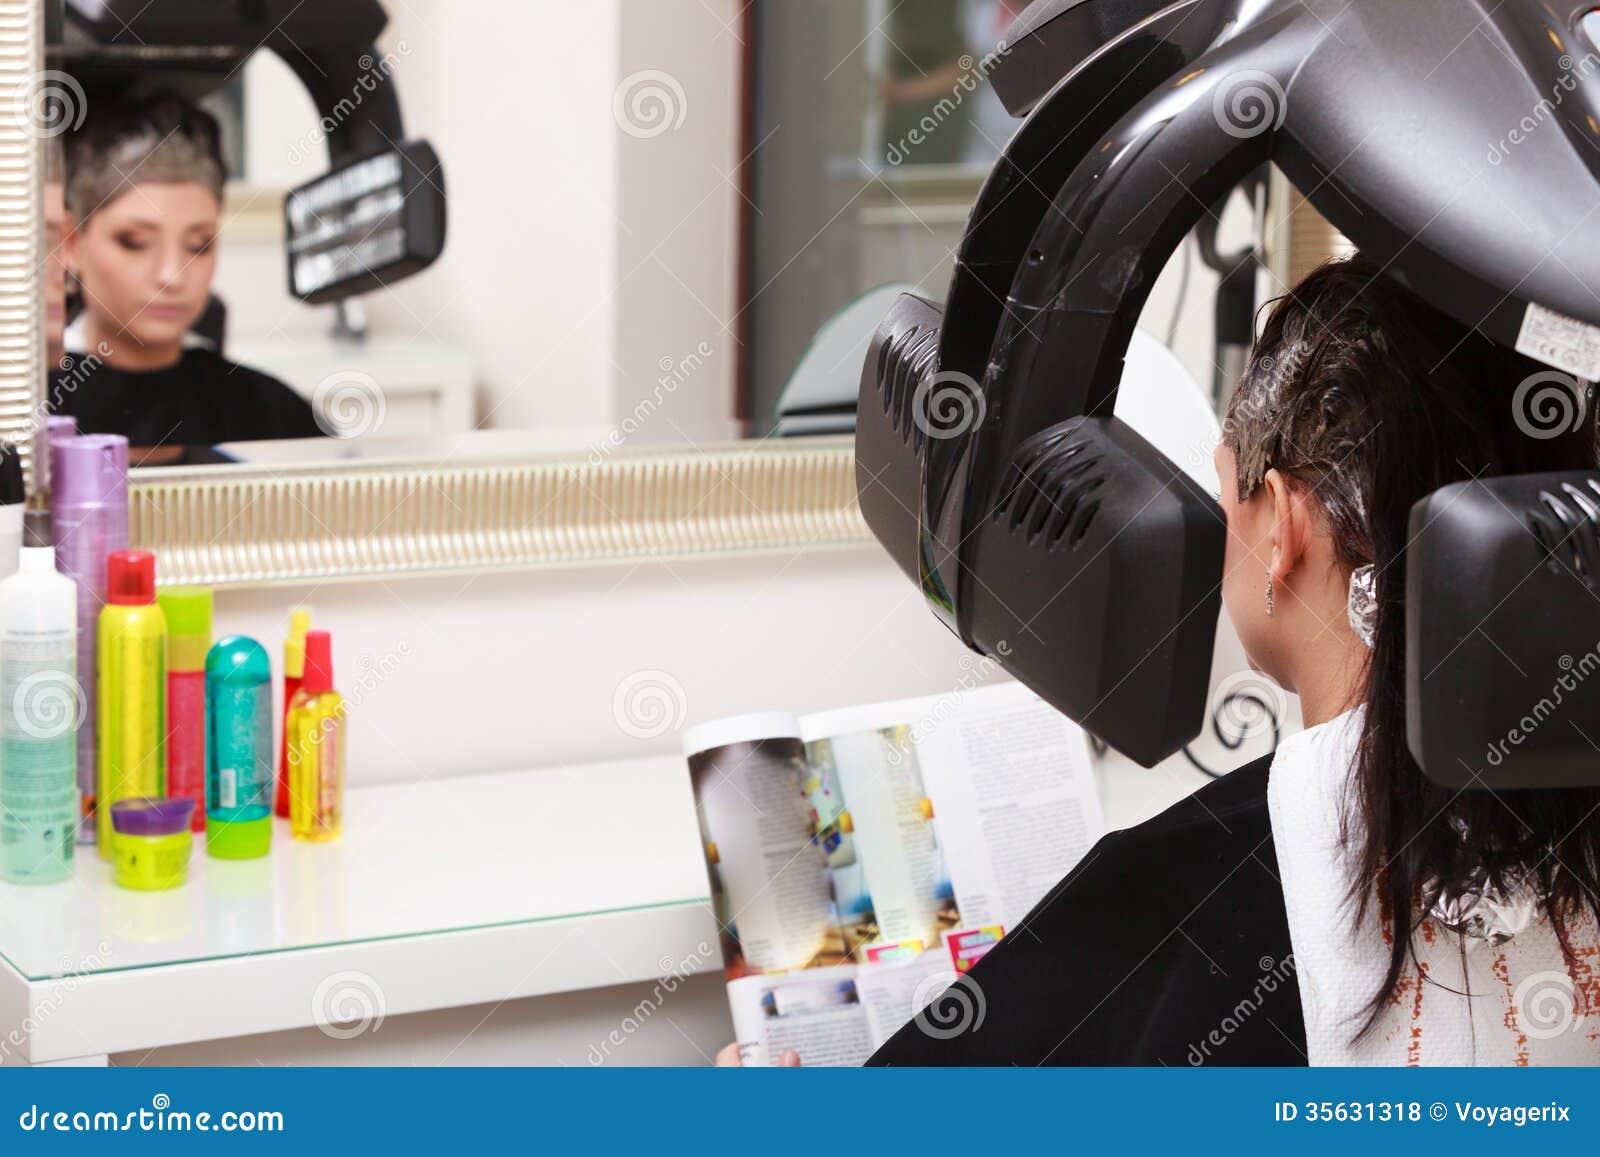 Hair salon business cards joy studio design gallery for Reading beauty salon